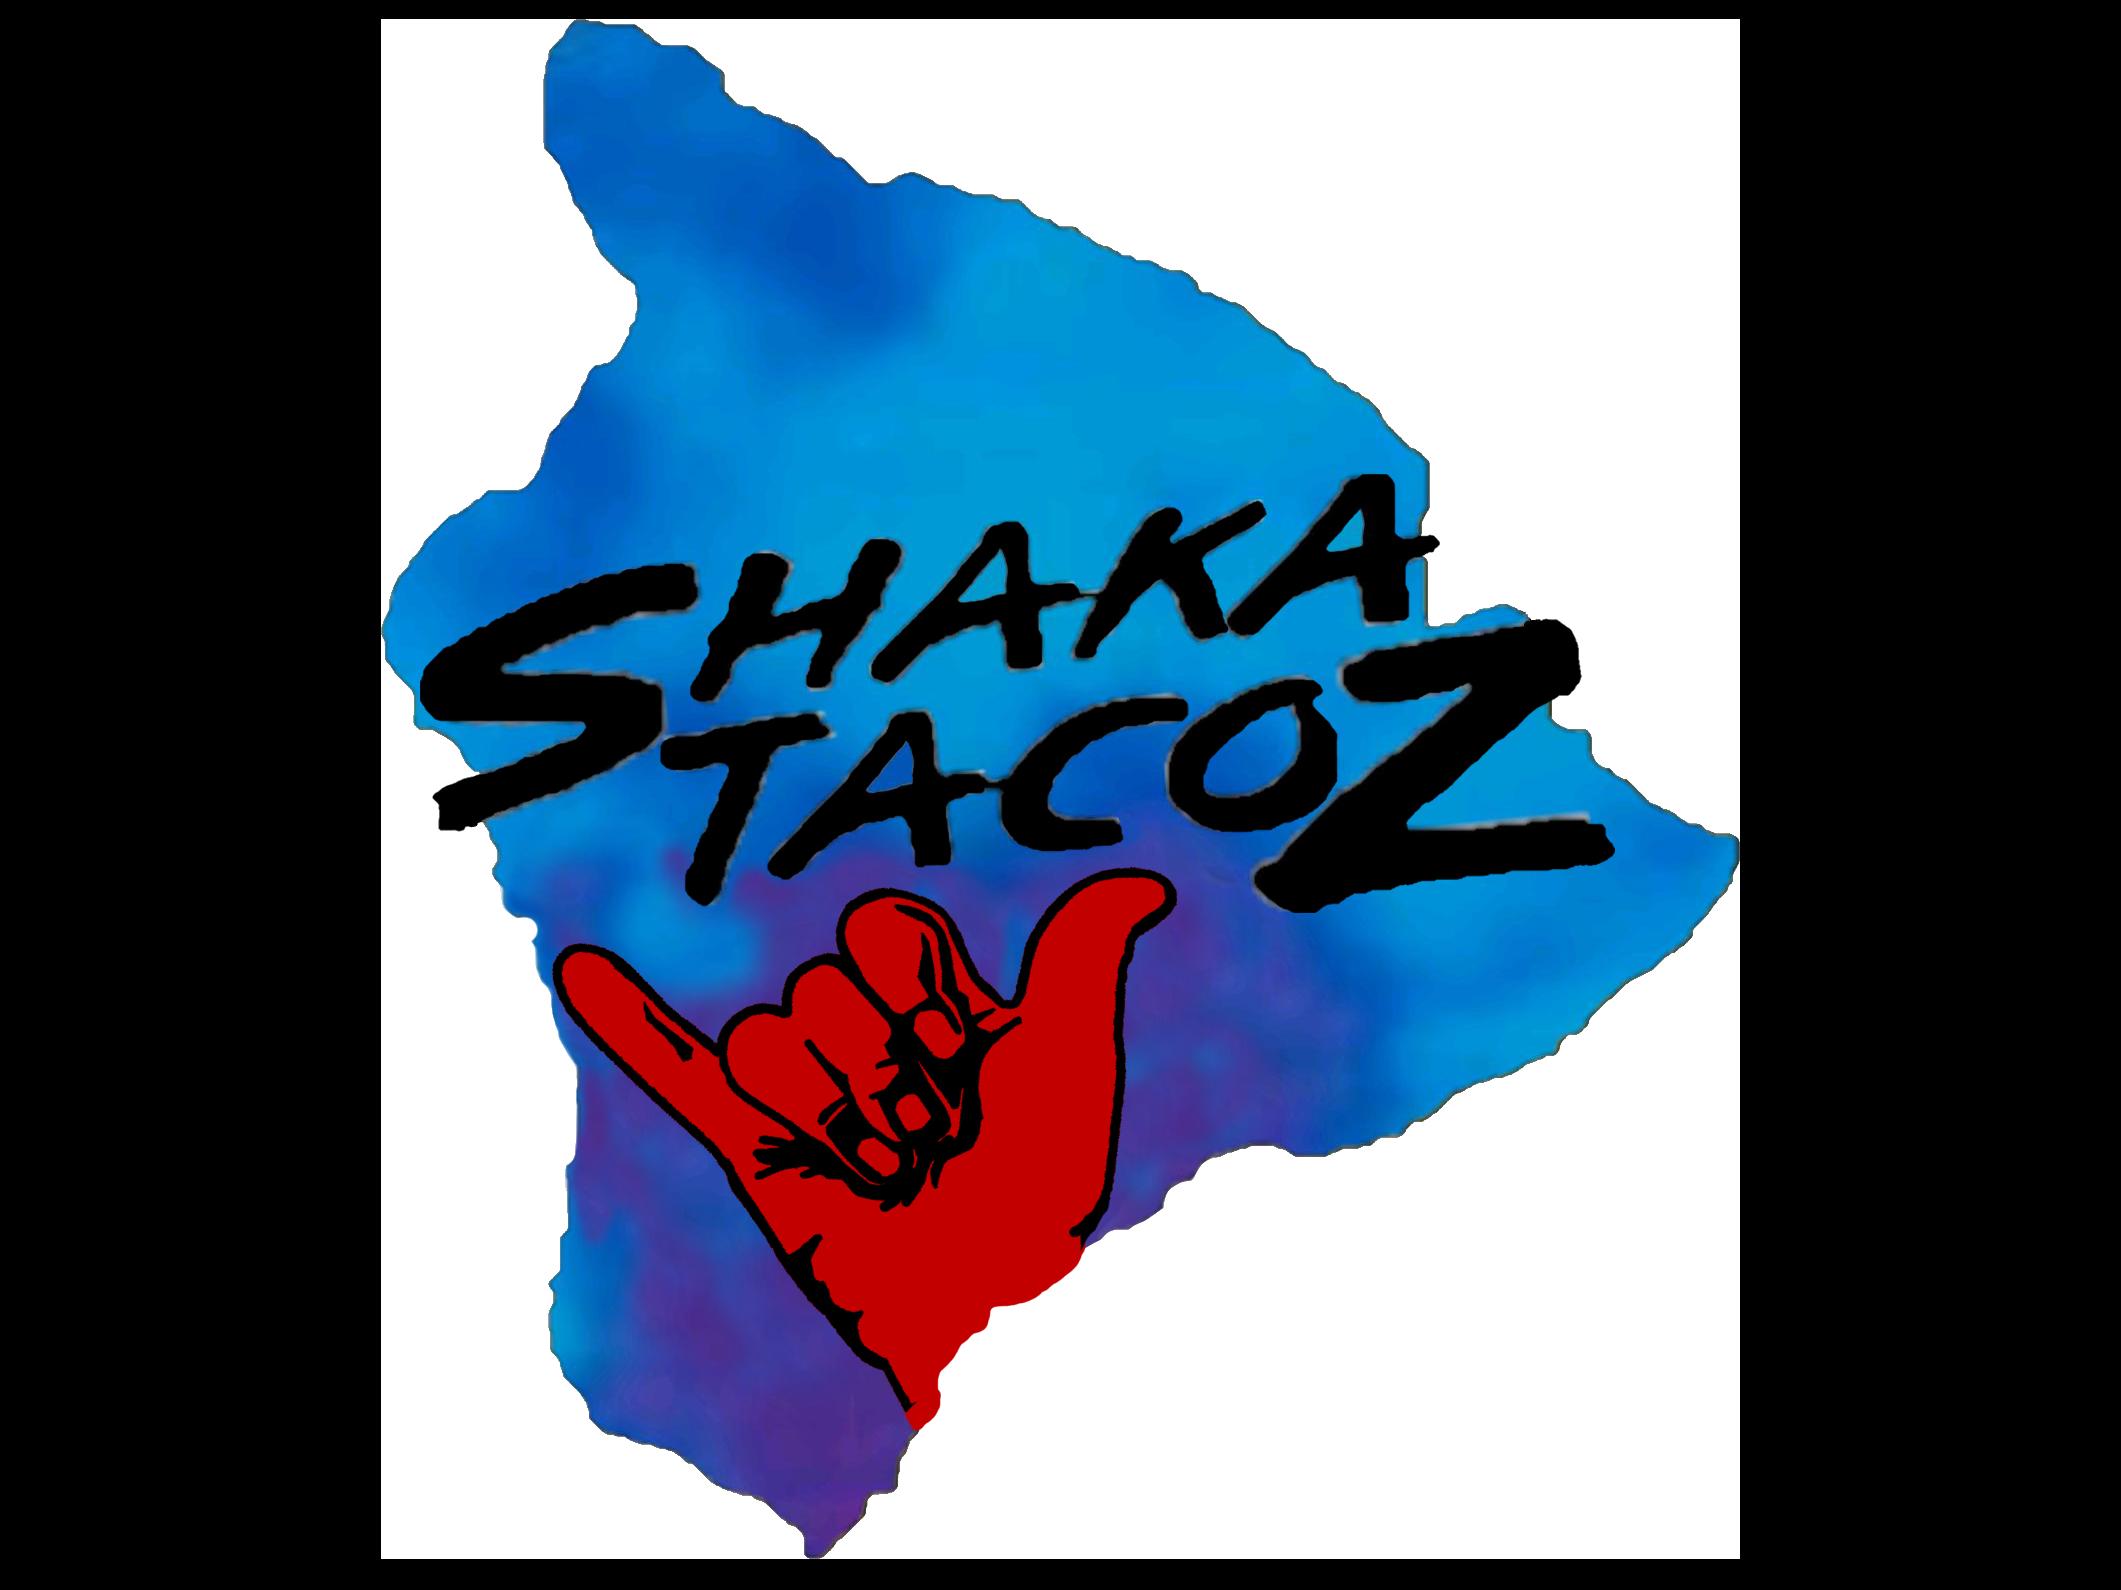 Shaka Tacoz